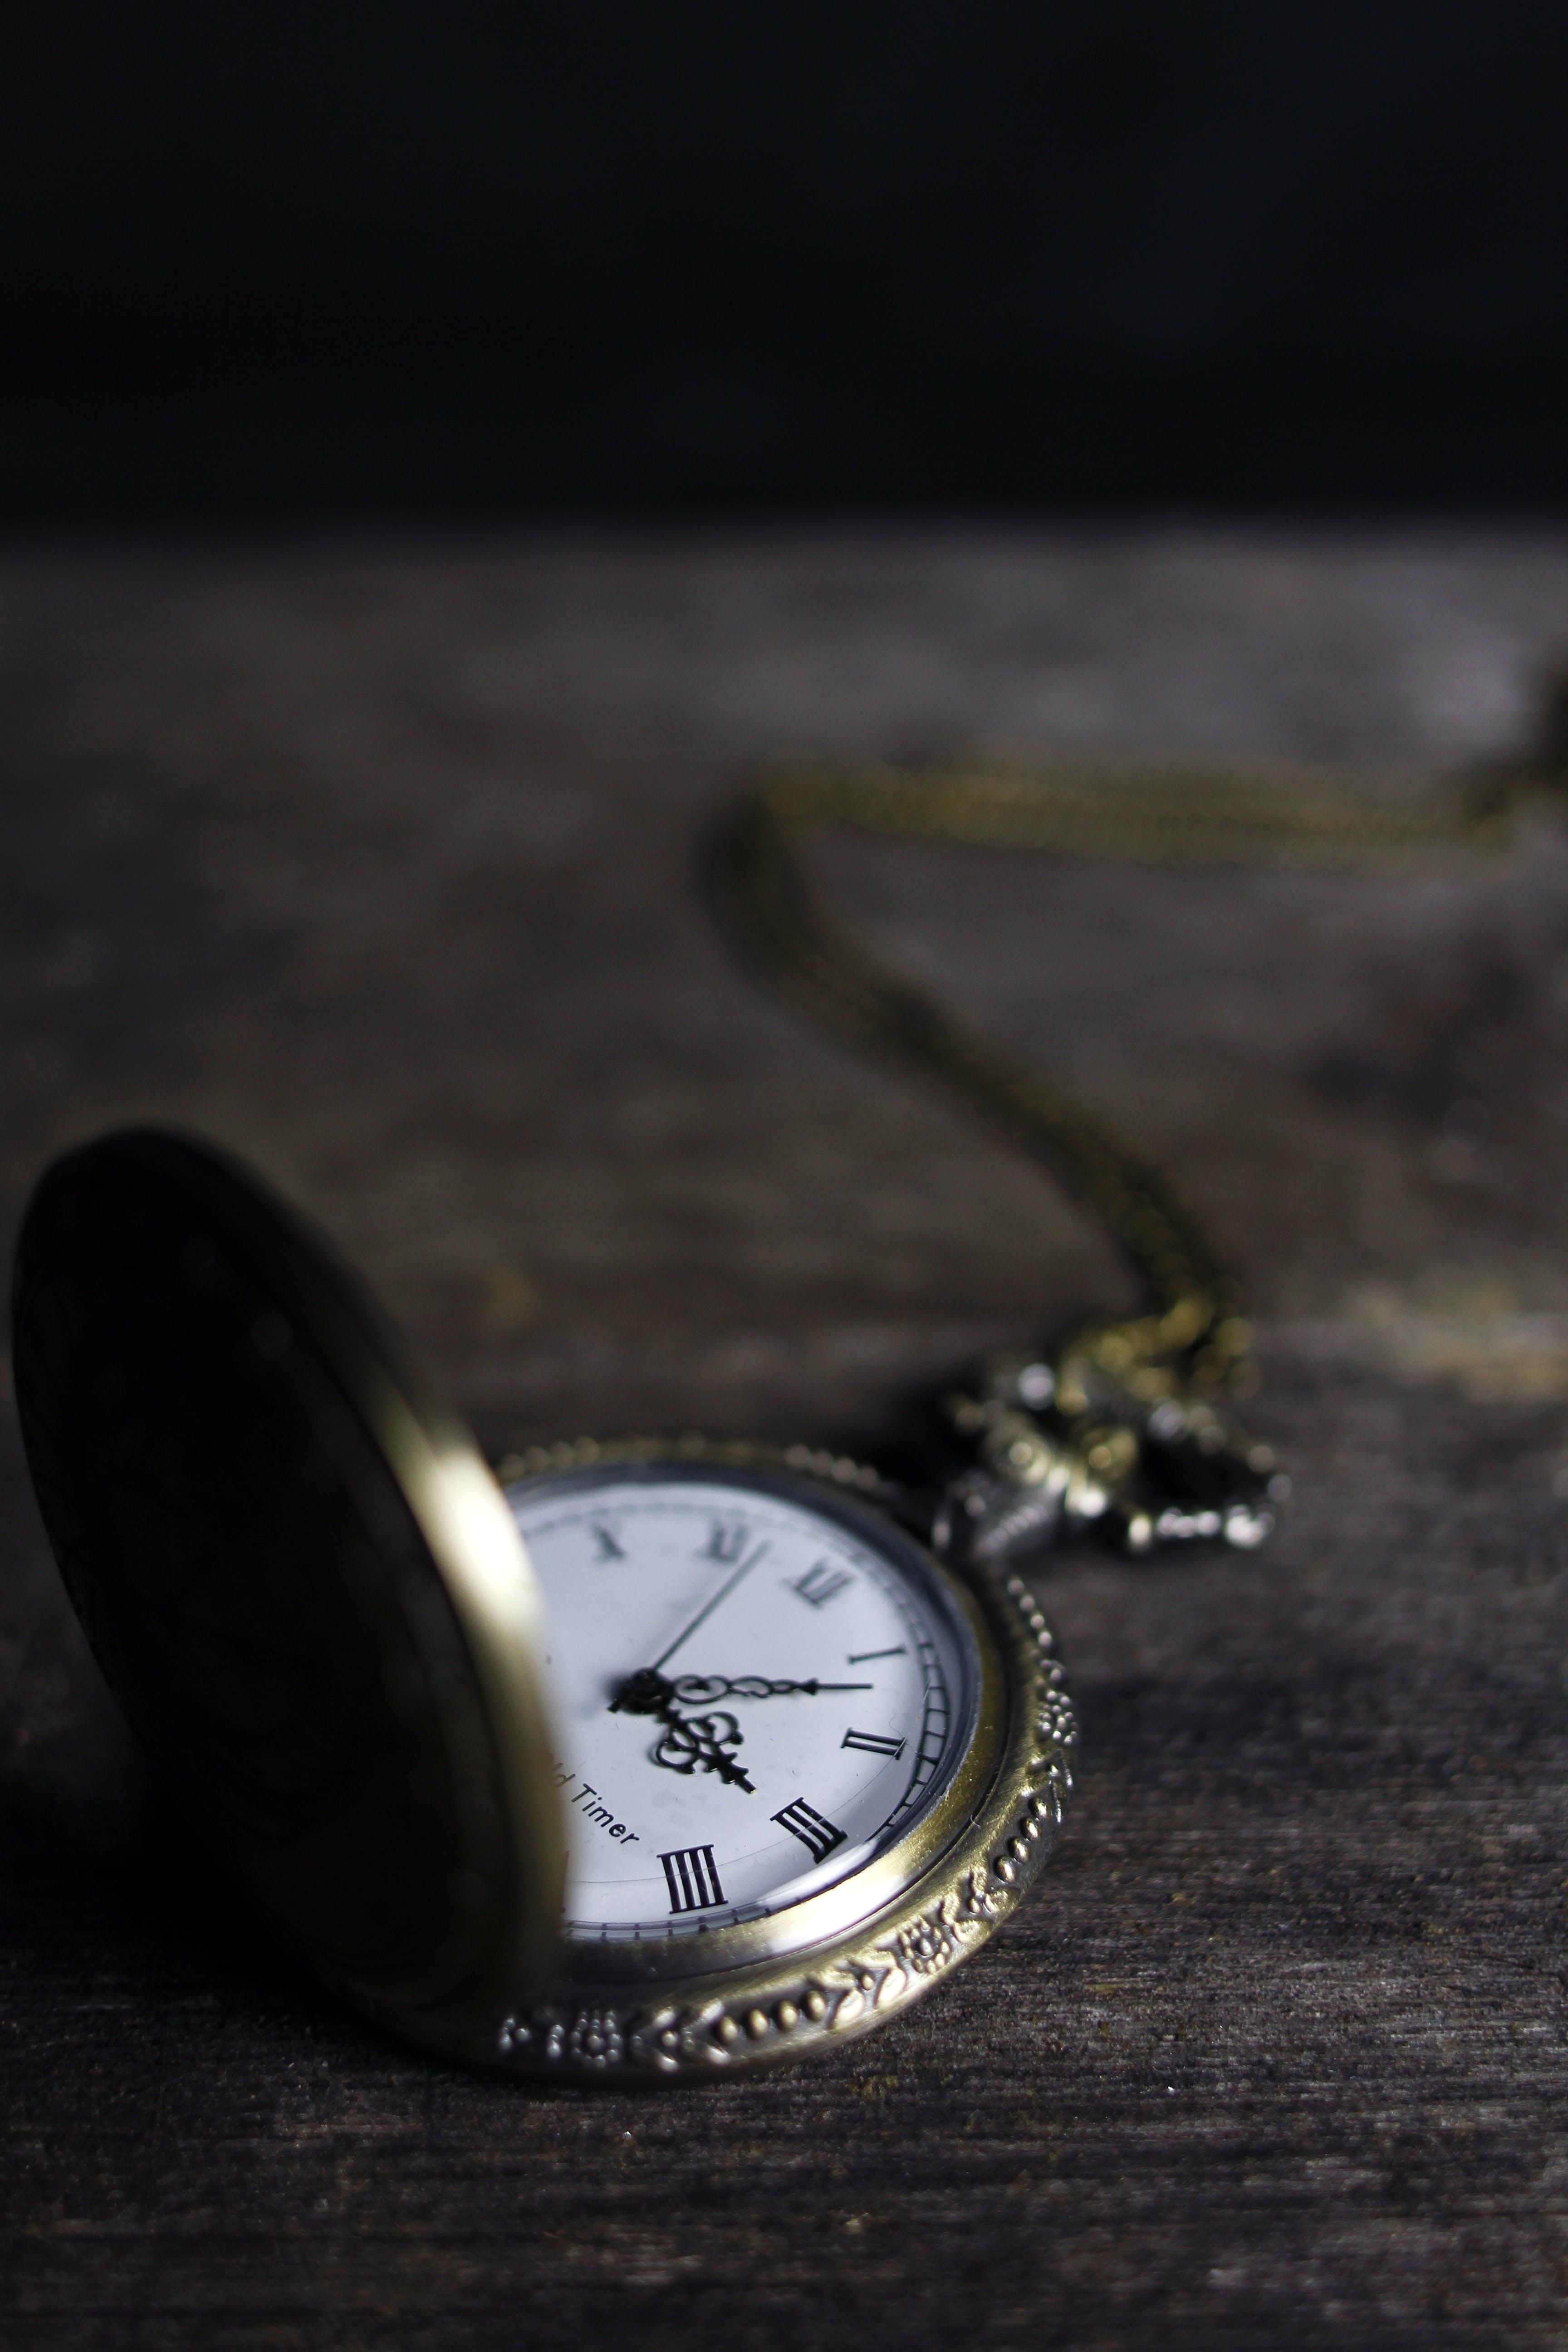 analog, antique, blur